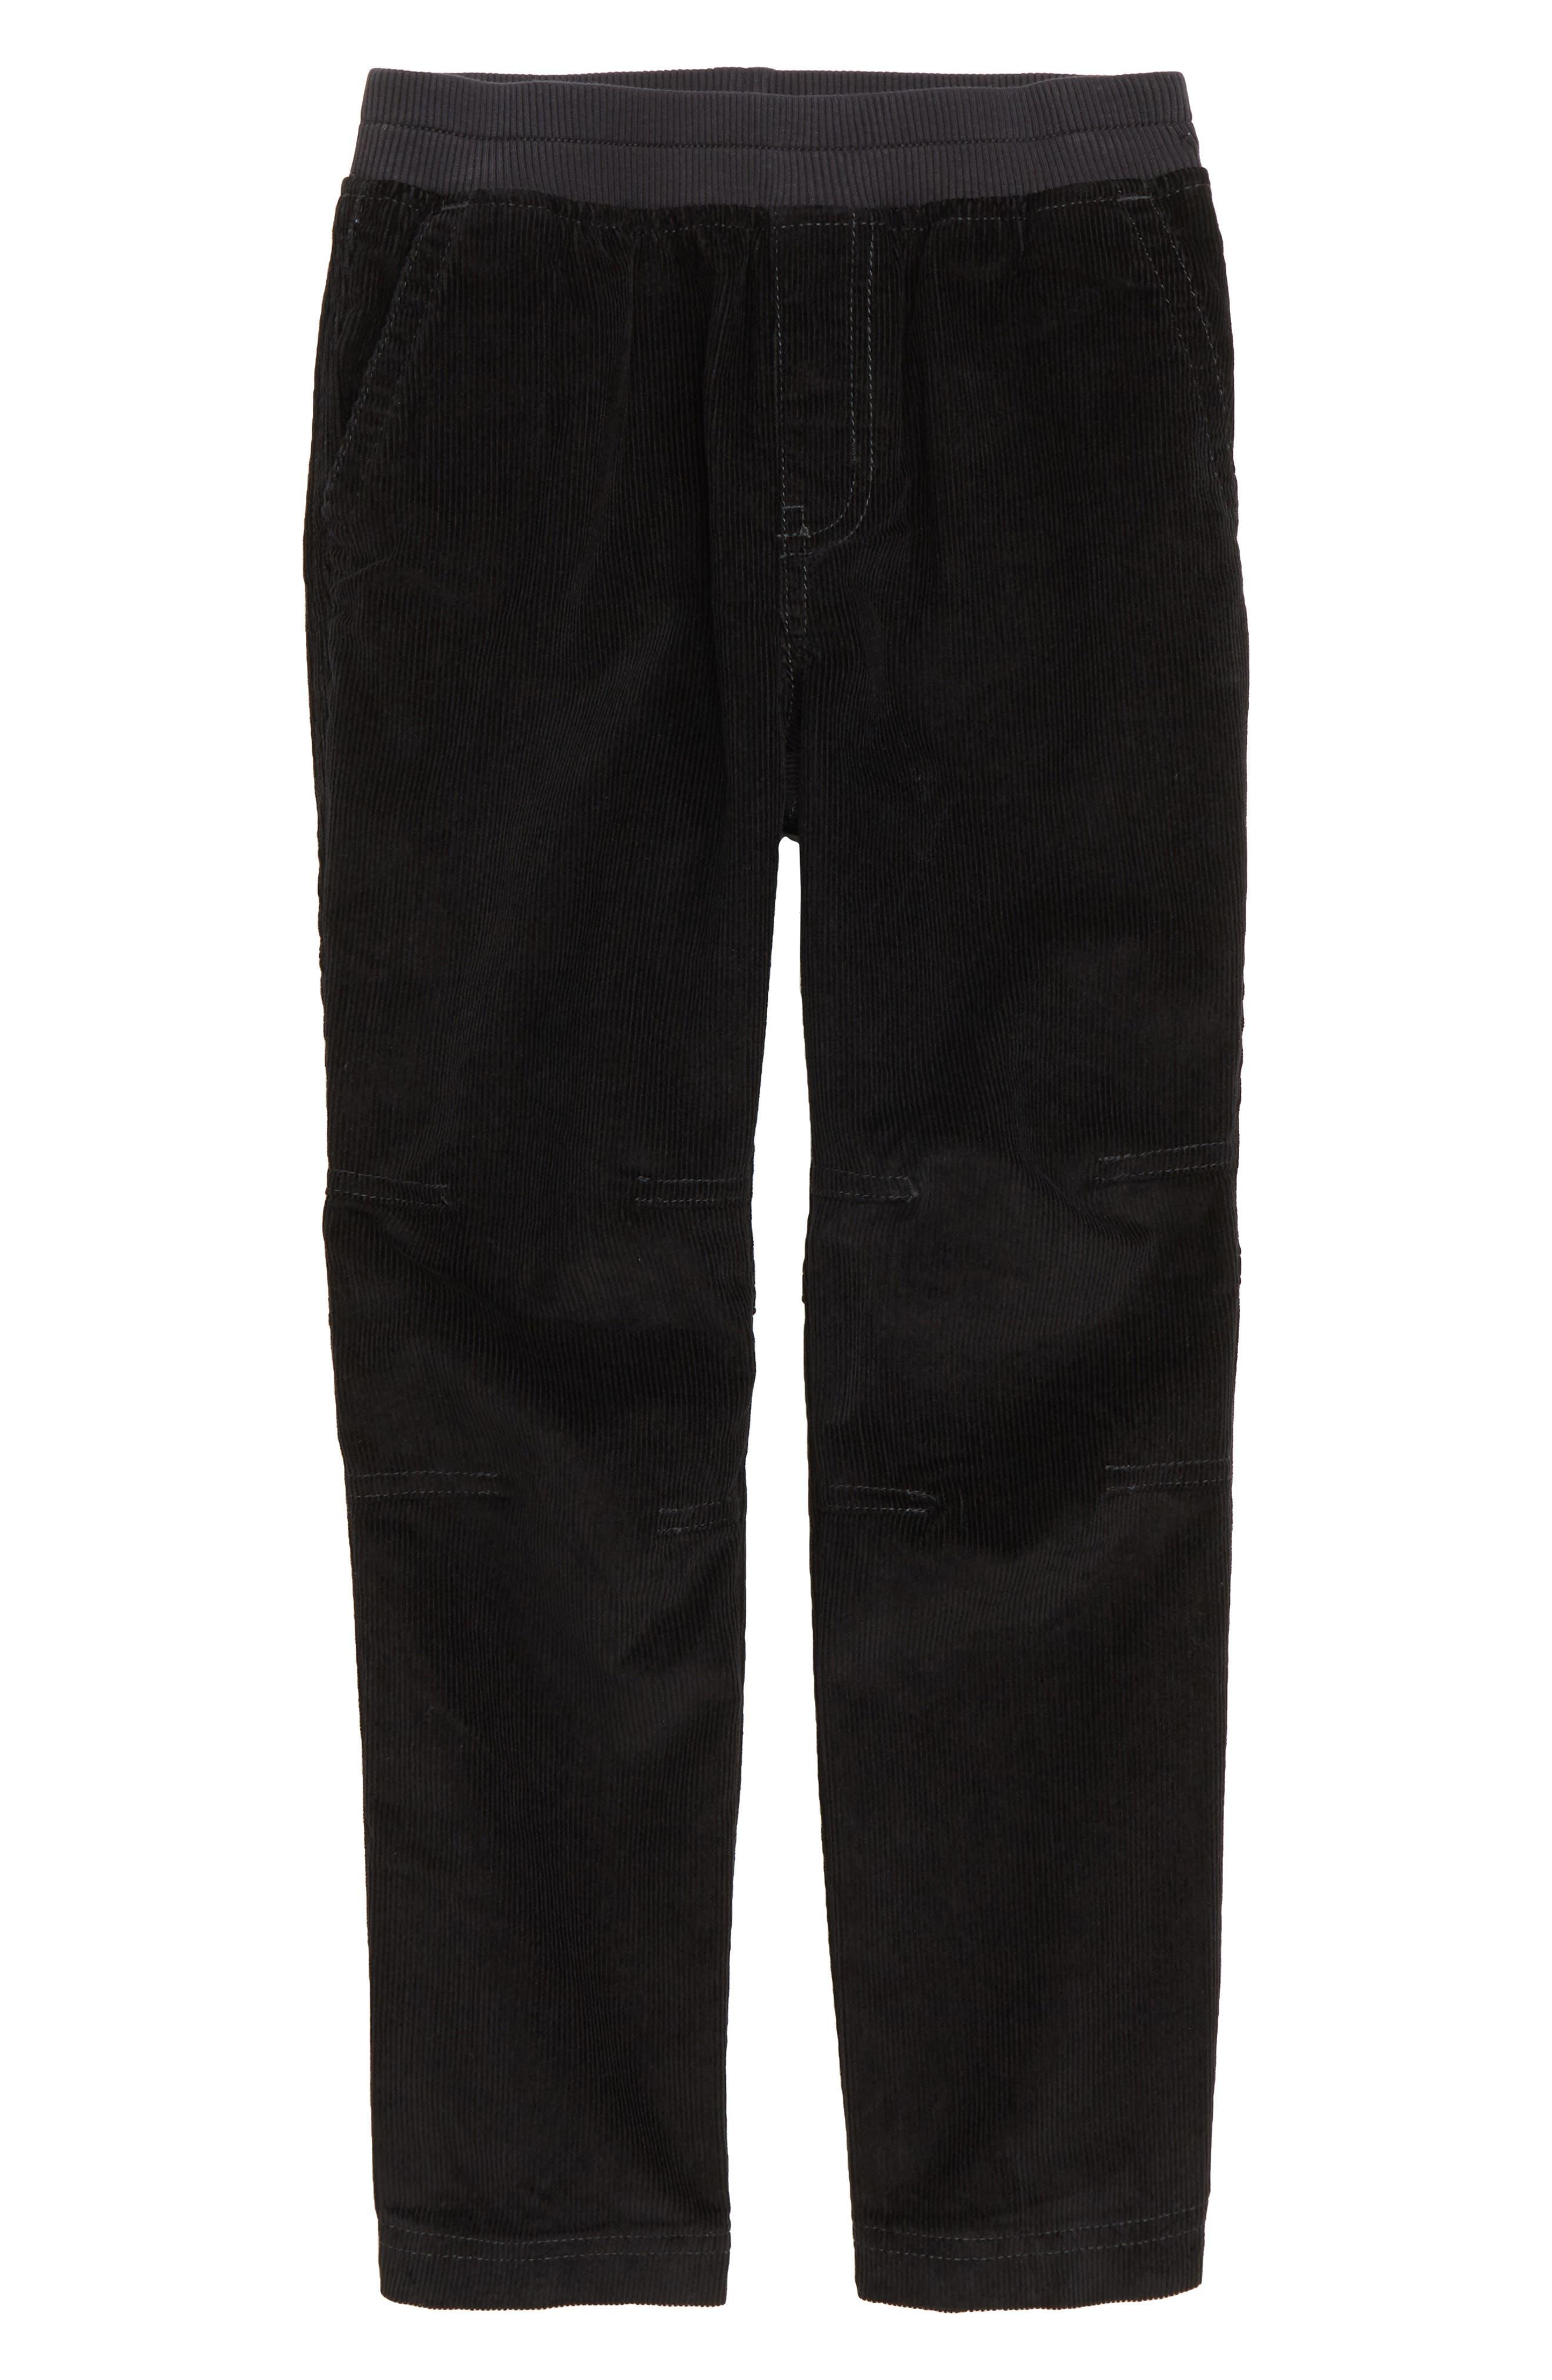 Easy Corduroy Pants,                             Main thumbnail 1, color,                             JET BLACK